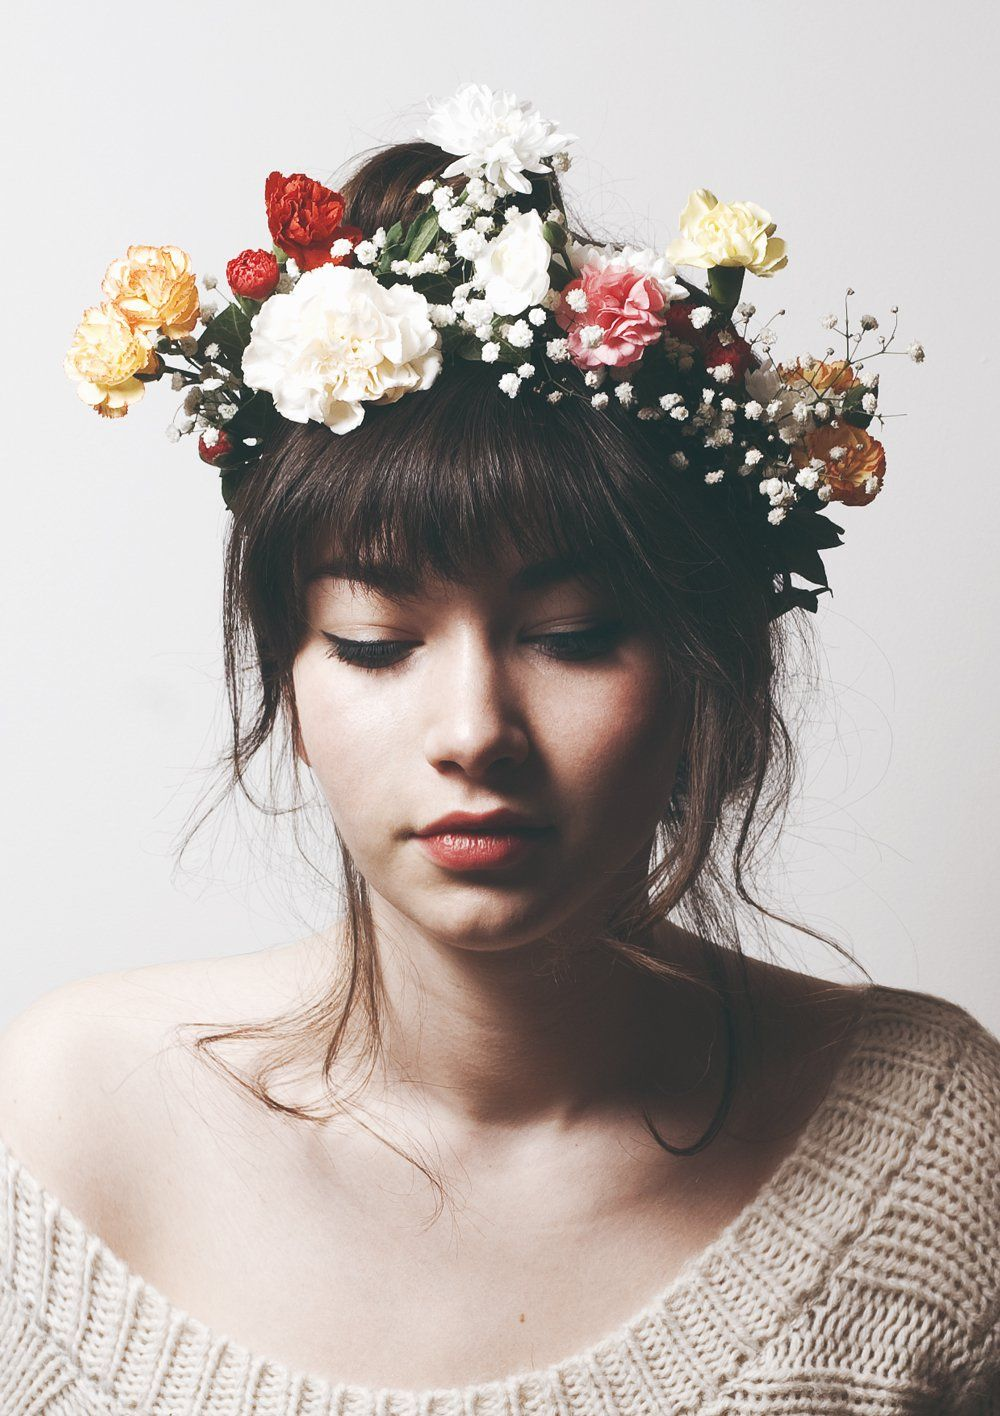 teenage girl flower crown - Google Search  e1f176c8ed2